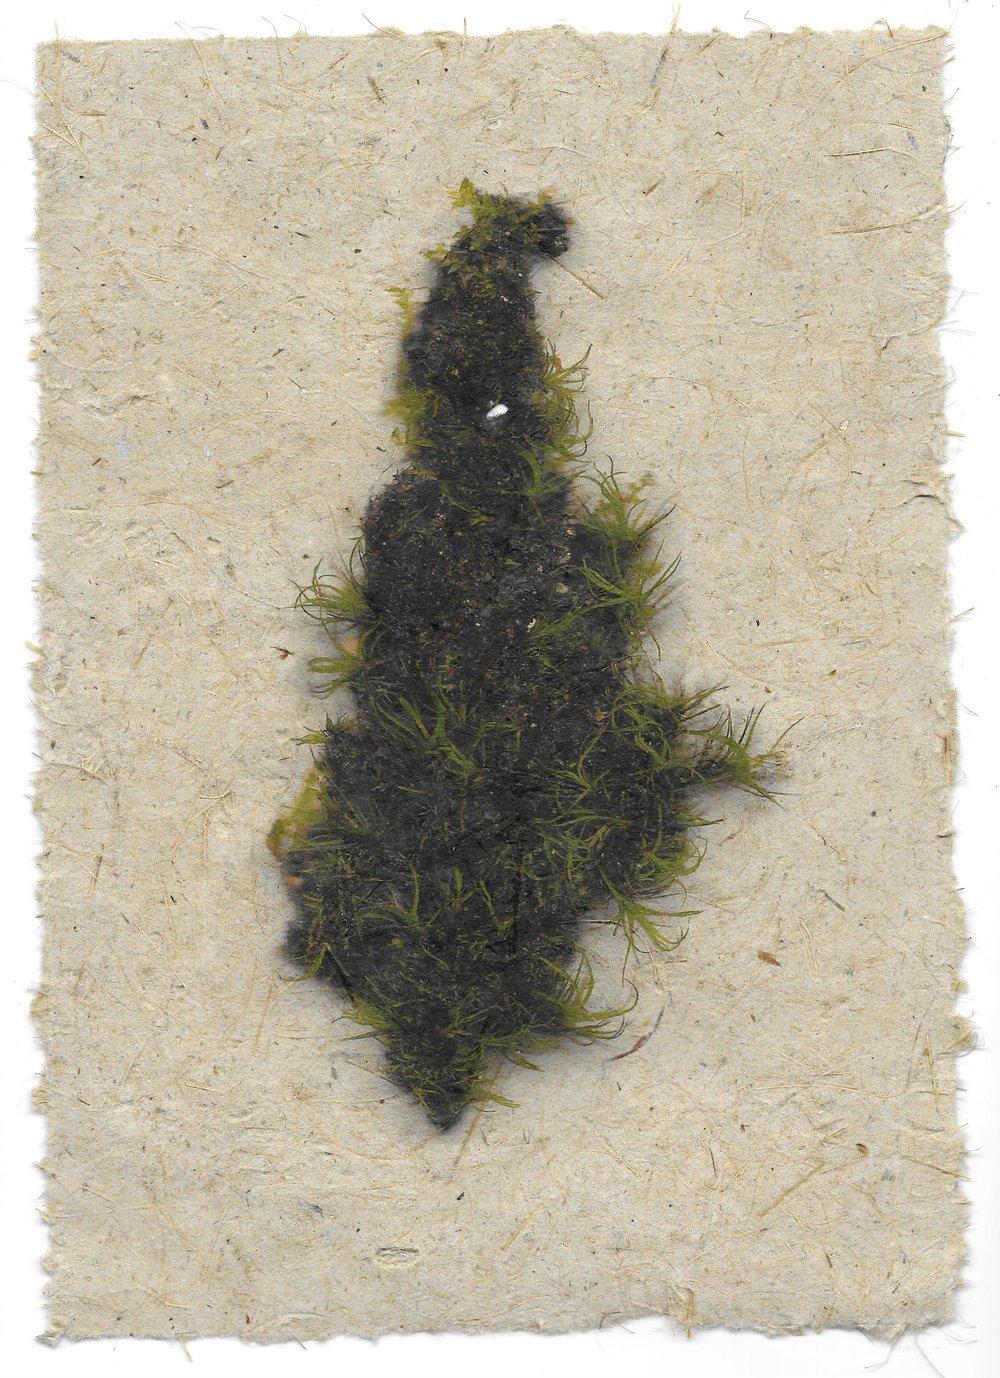 moss specimen #2